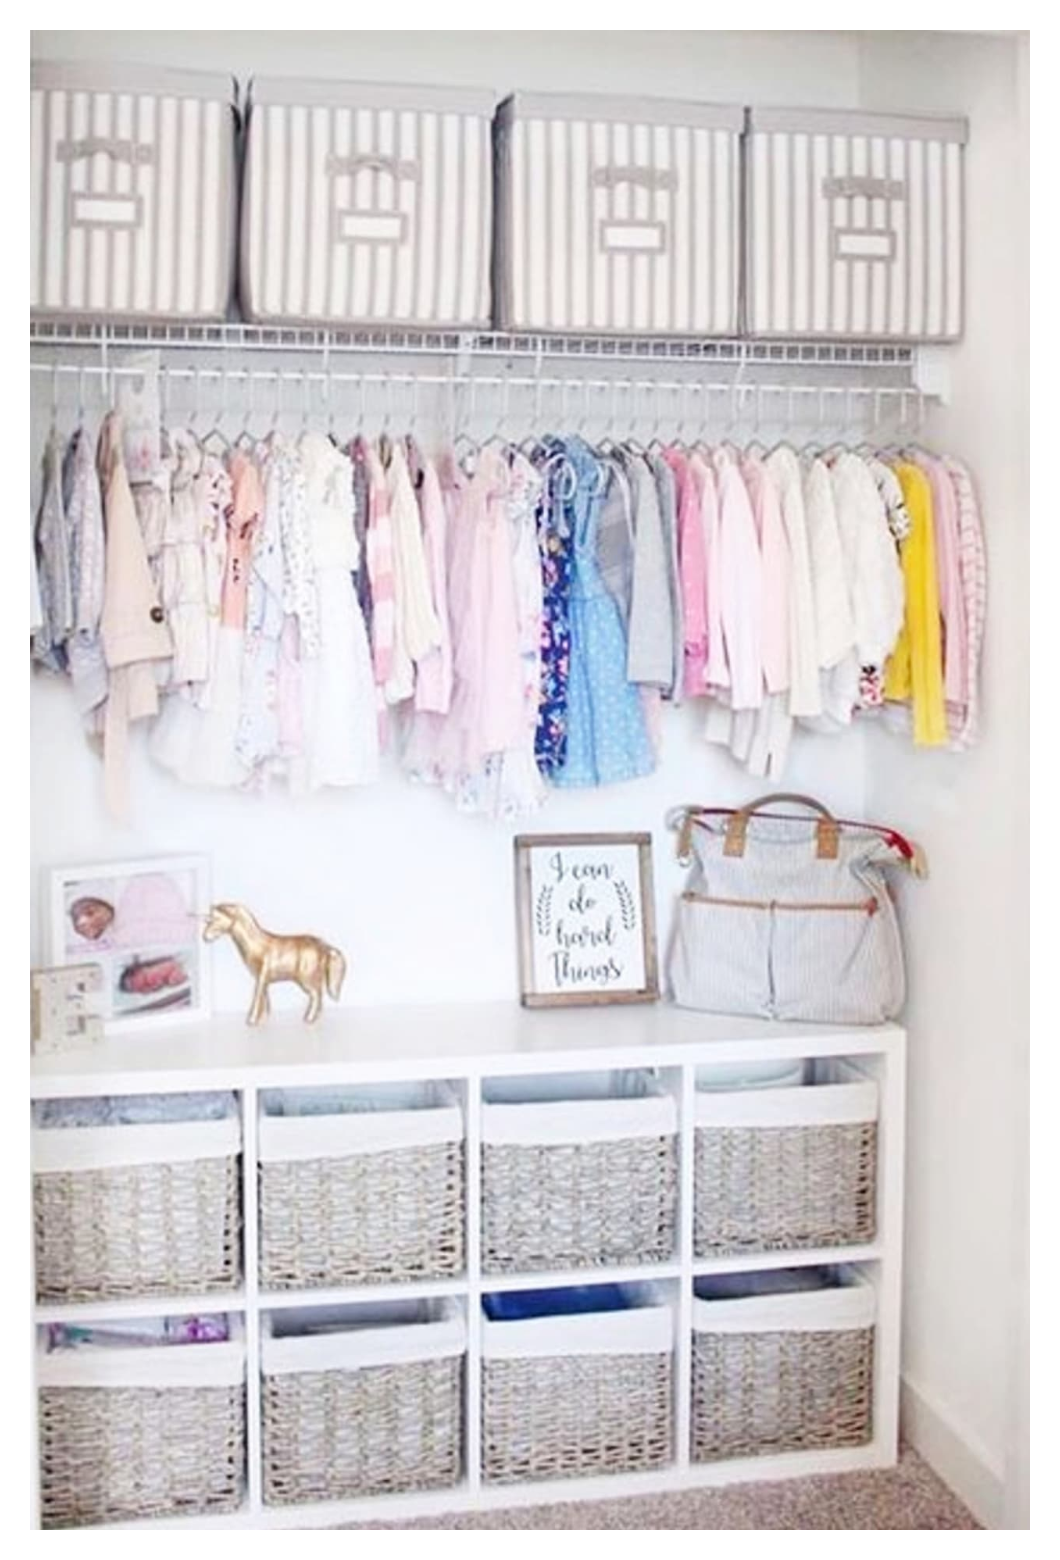 Baby Closet Ideas 47 Nursery Closet Organization Storage And Baby Closet Organizer In 2020 Baby Closet Organization Nursery Closet Organization Baby Room Organization